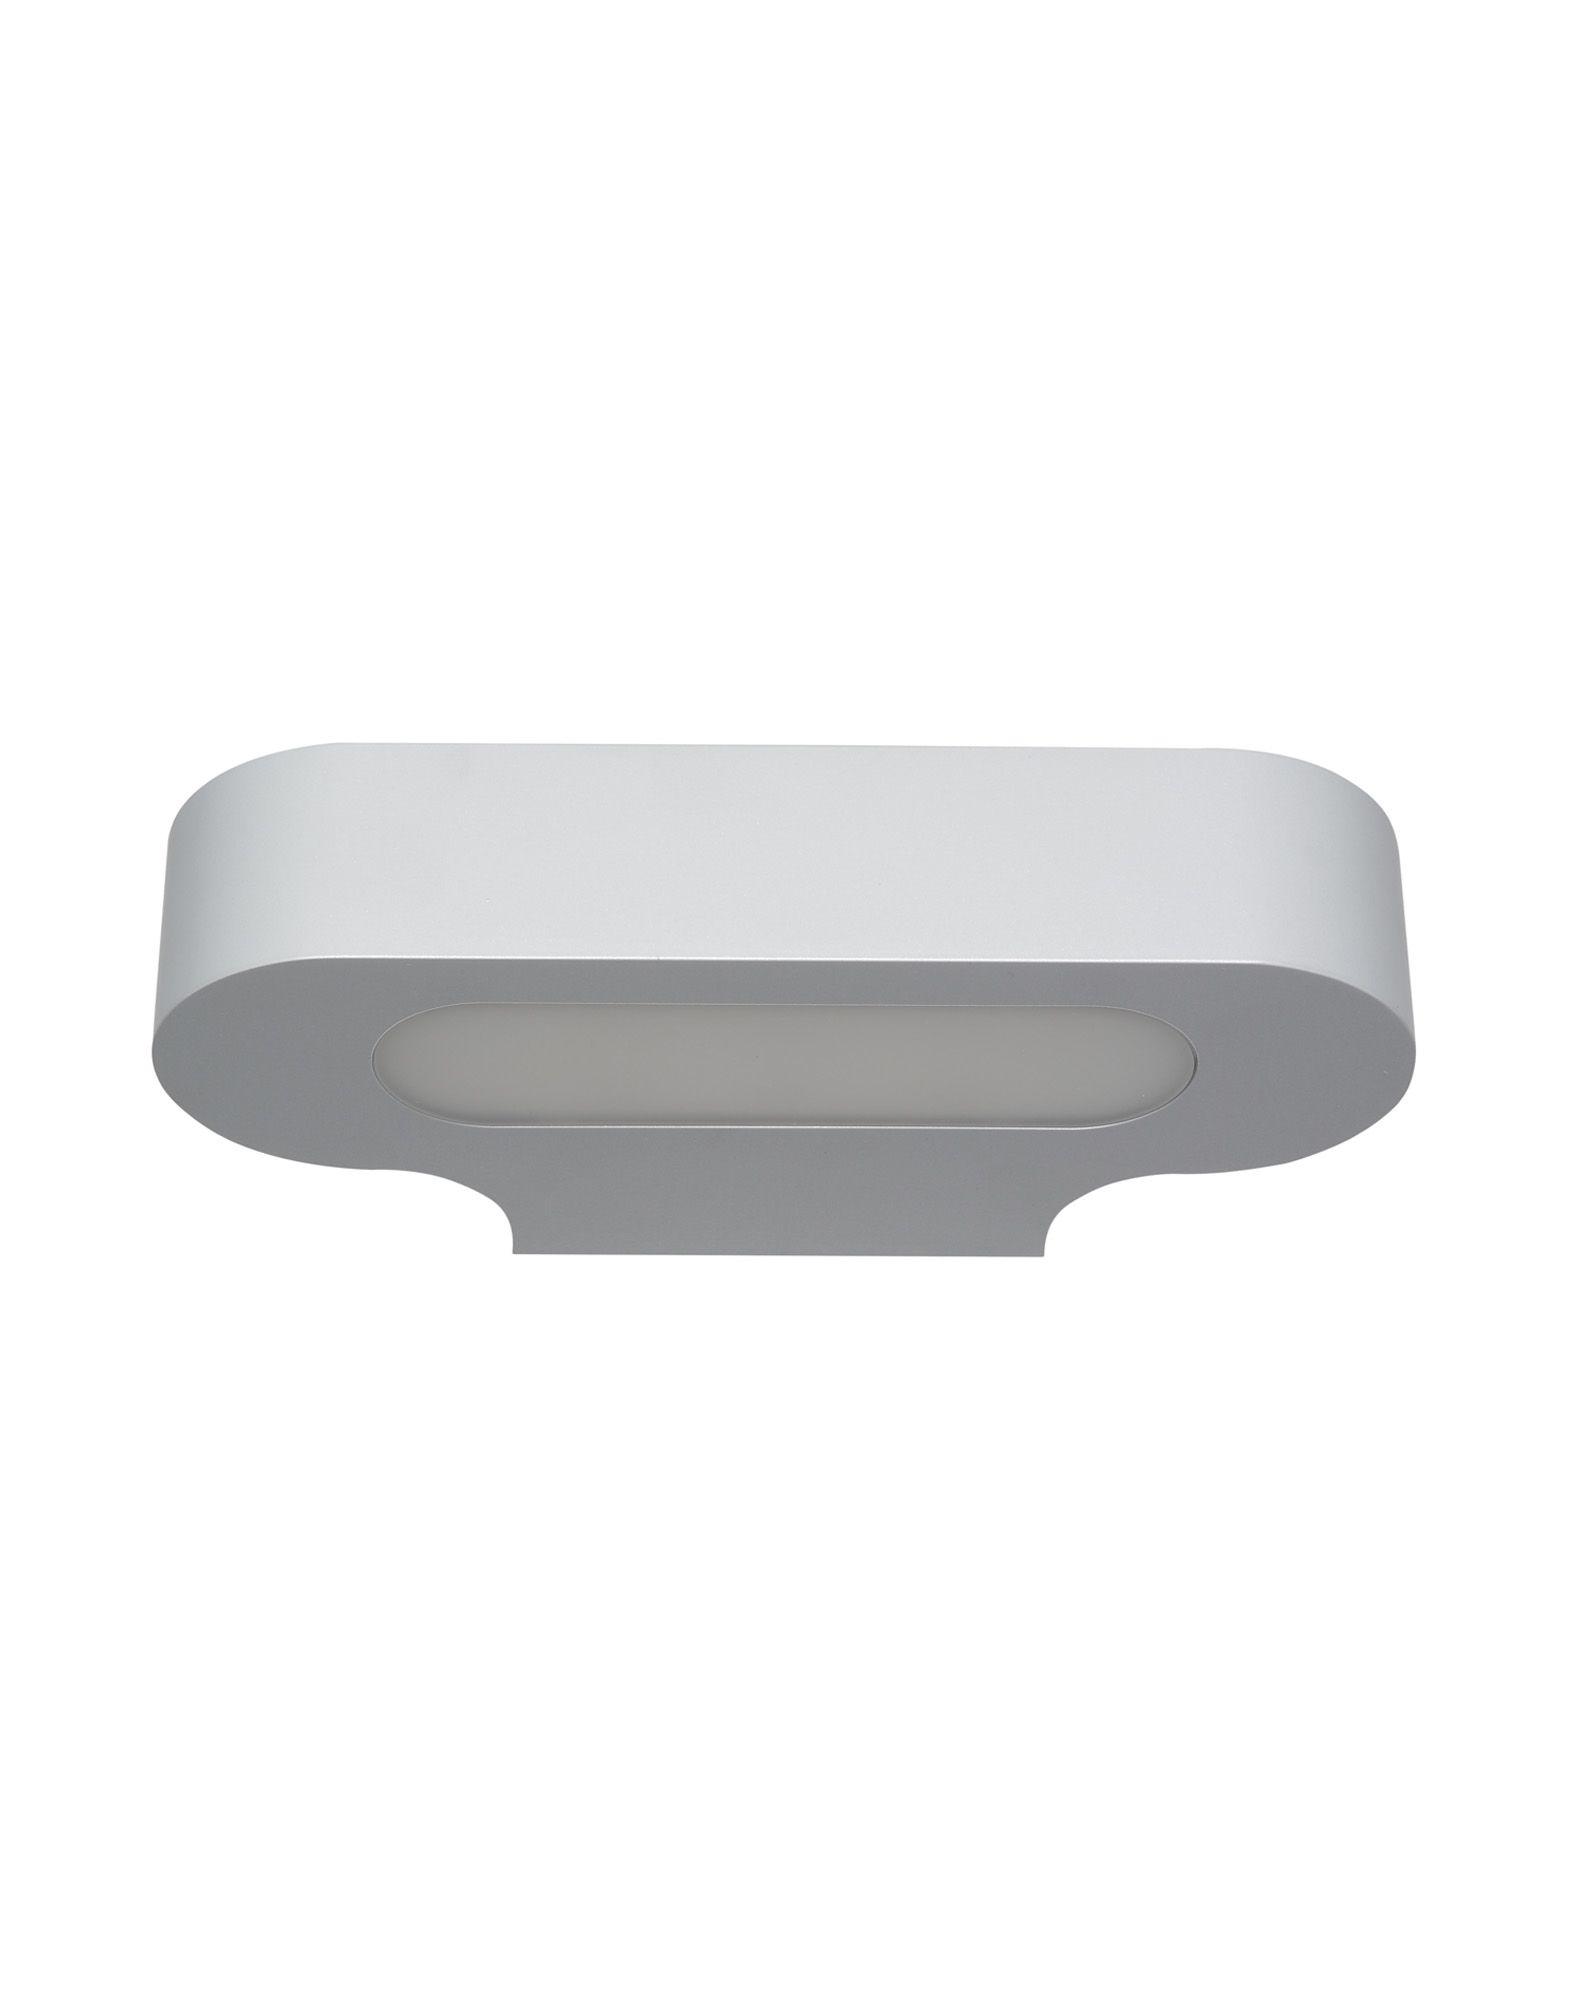 ARTEMIDE Настенная лампа artemide 0387020a logico nano plafone inc